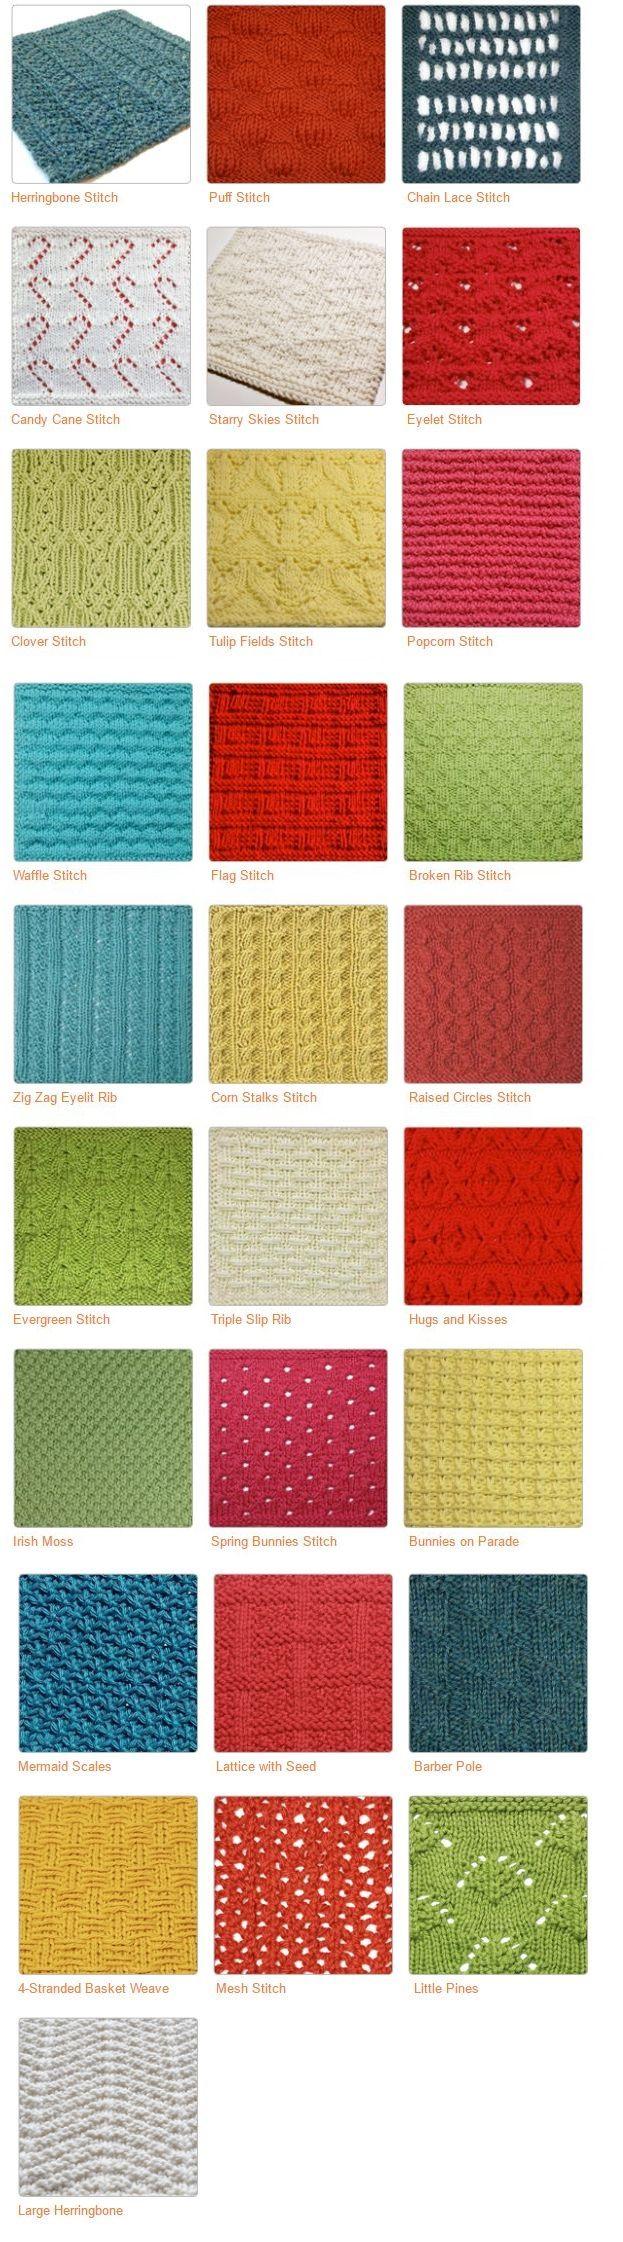 Loom Knit Stitches Loom Knitting Pinterest Loom Knitting